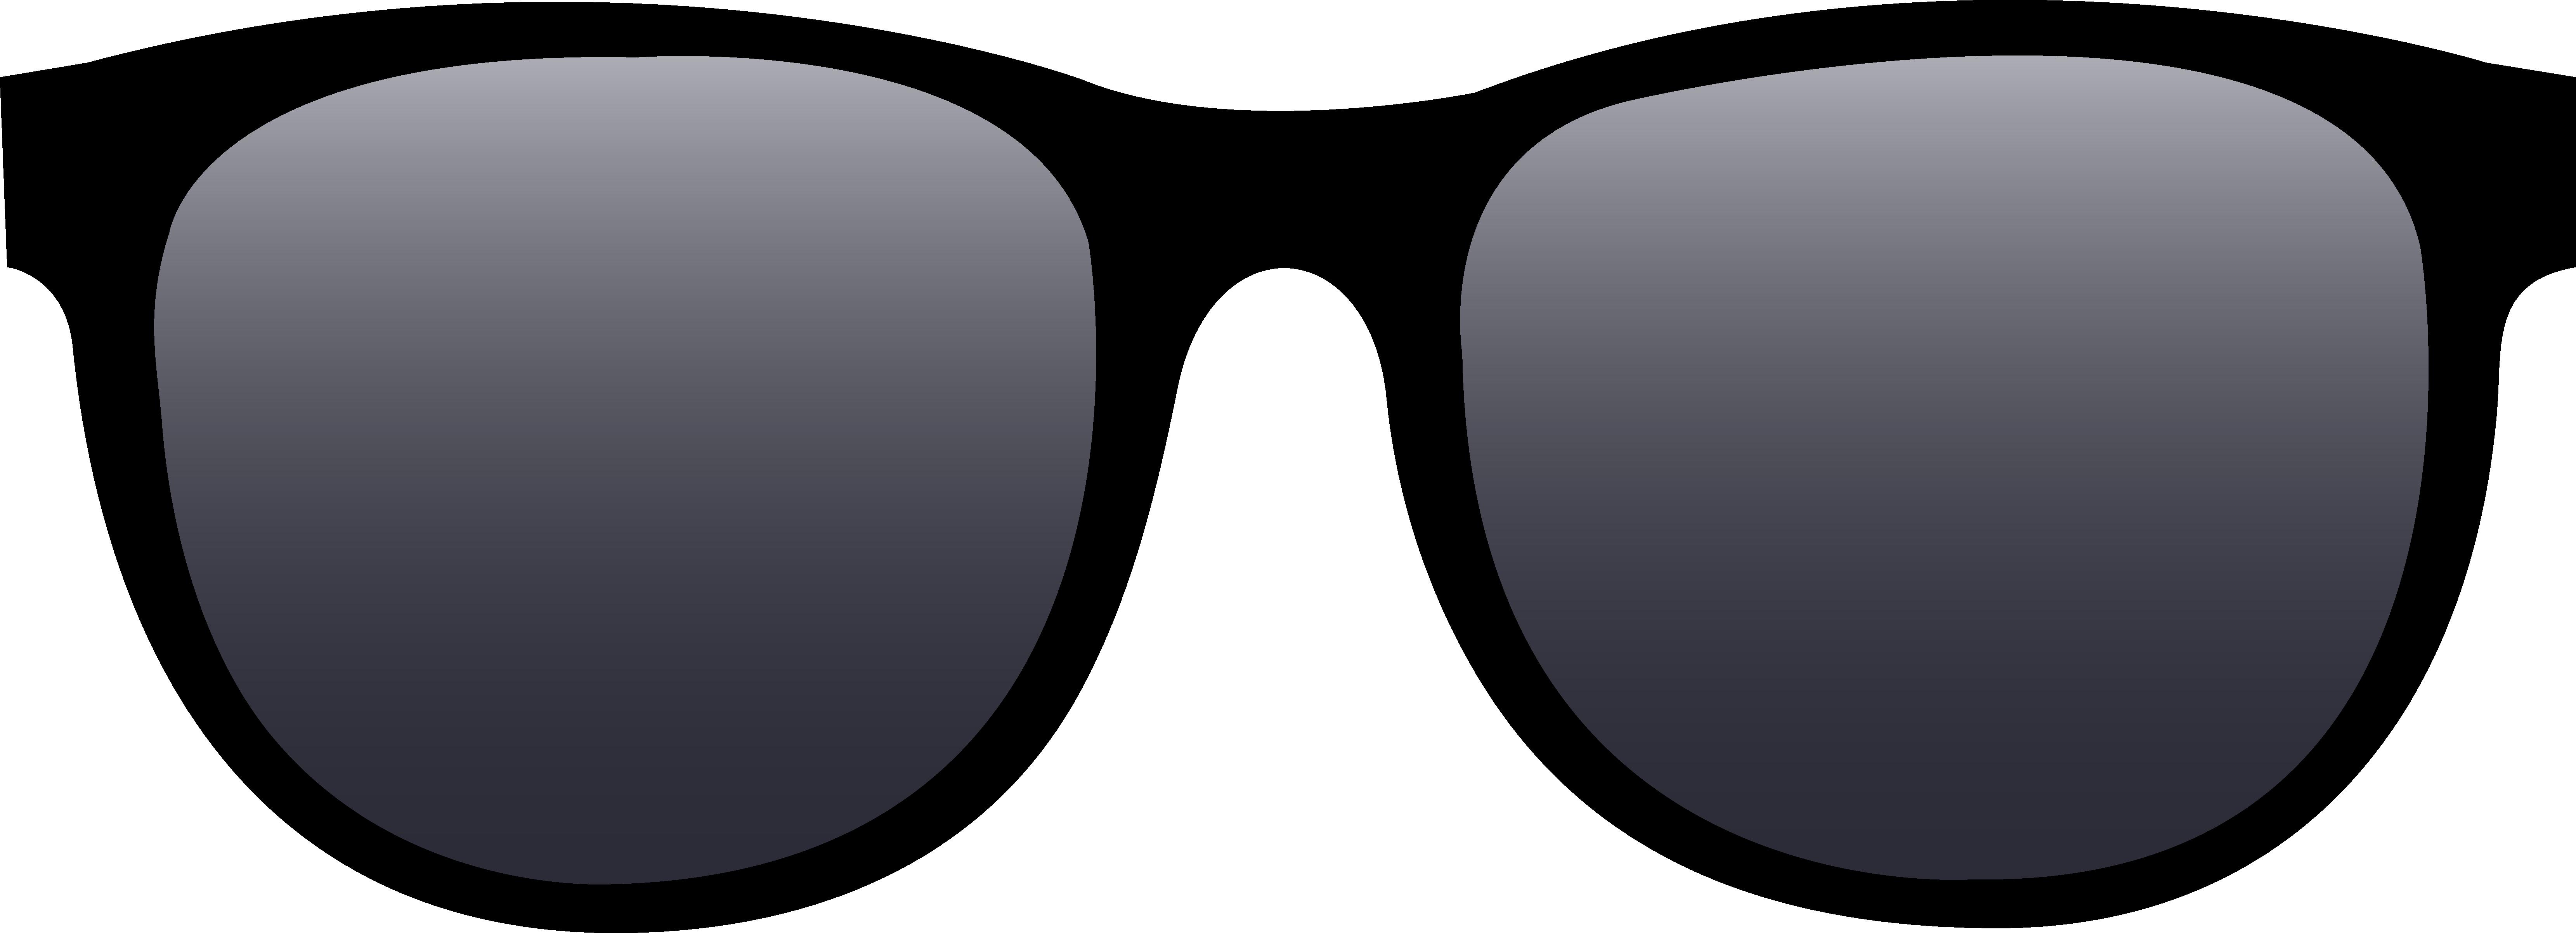 Sunglasses Vector Free-Sunglasses Vector Free-16